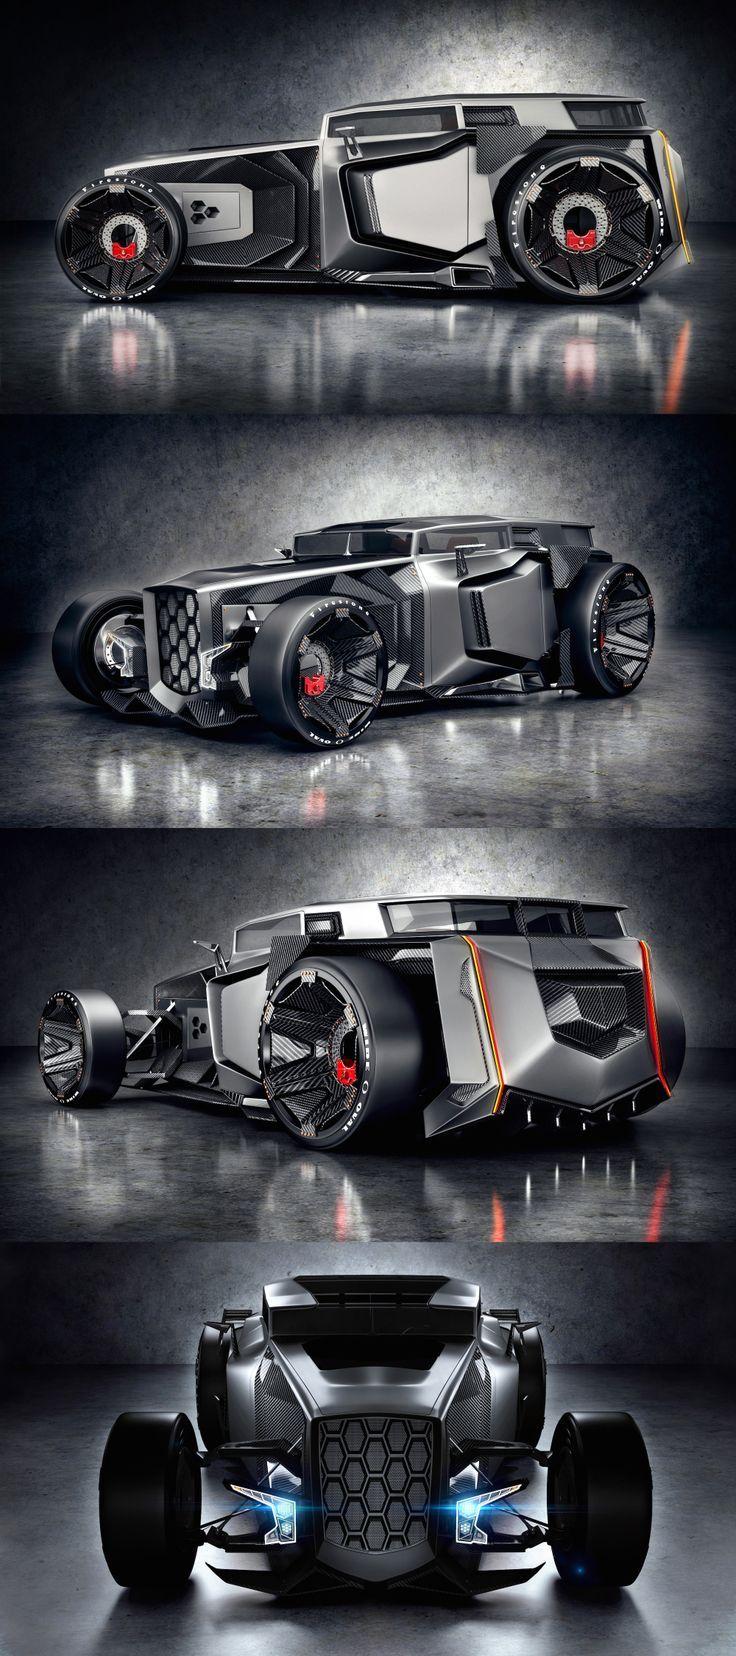 Lamborghini Hot Rod concept. Hot or Not? You decide... #TinderforCars